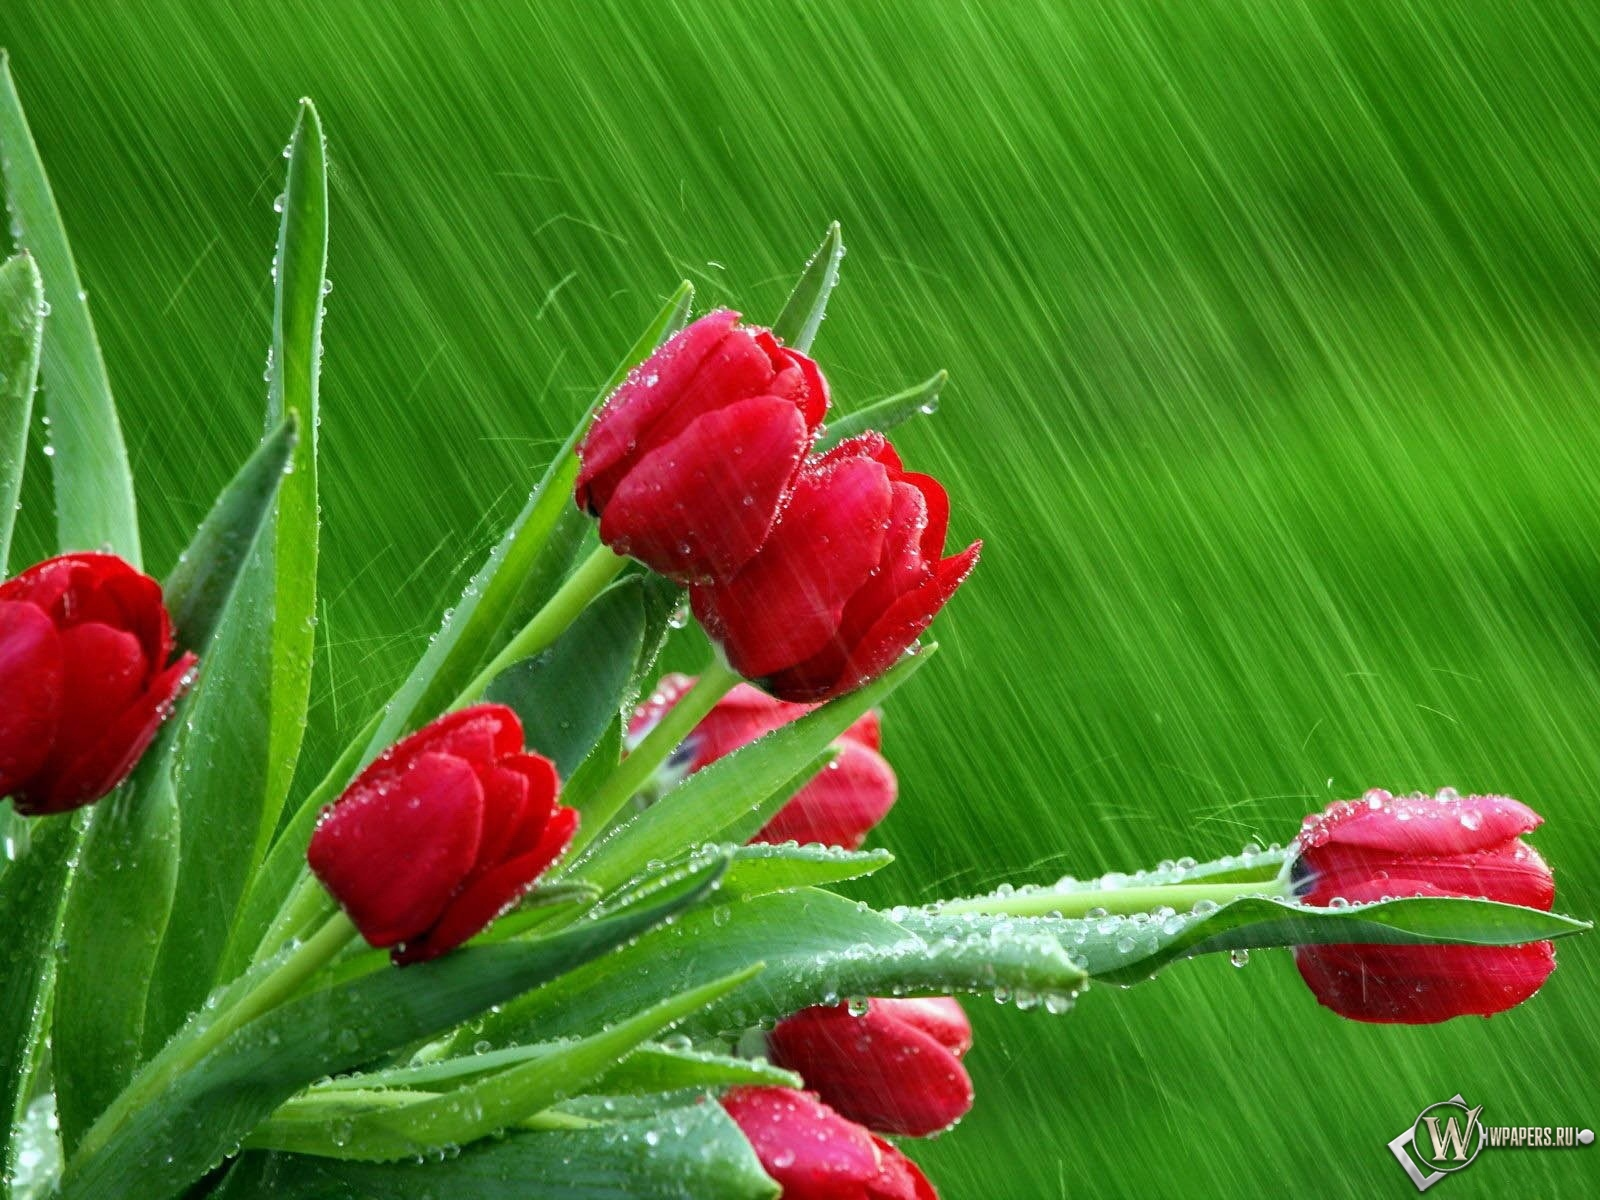 Тюльпаны на зелёном фоне 1600x1200